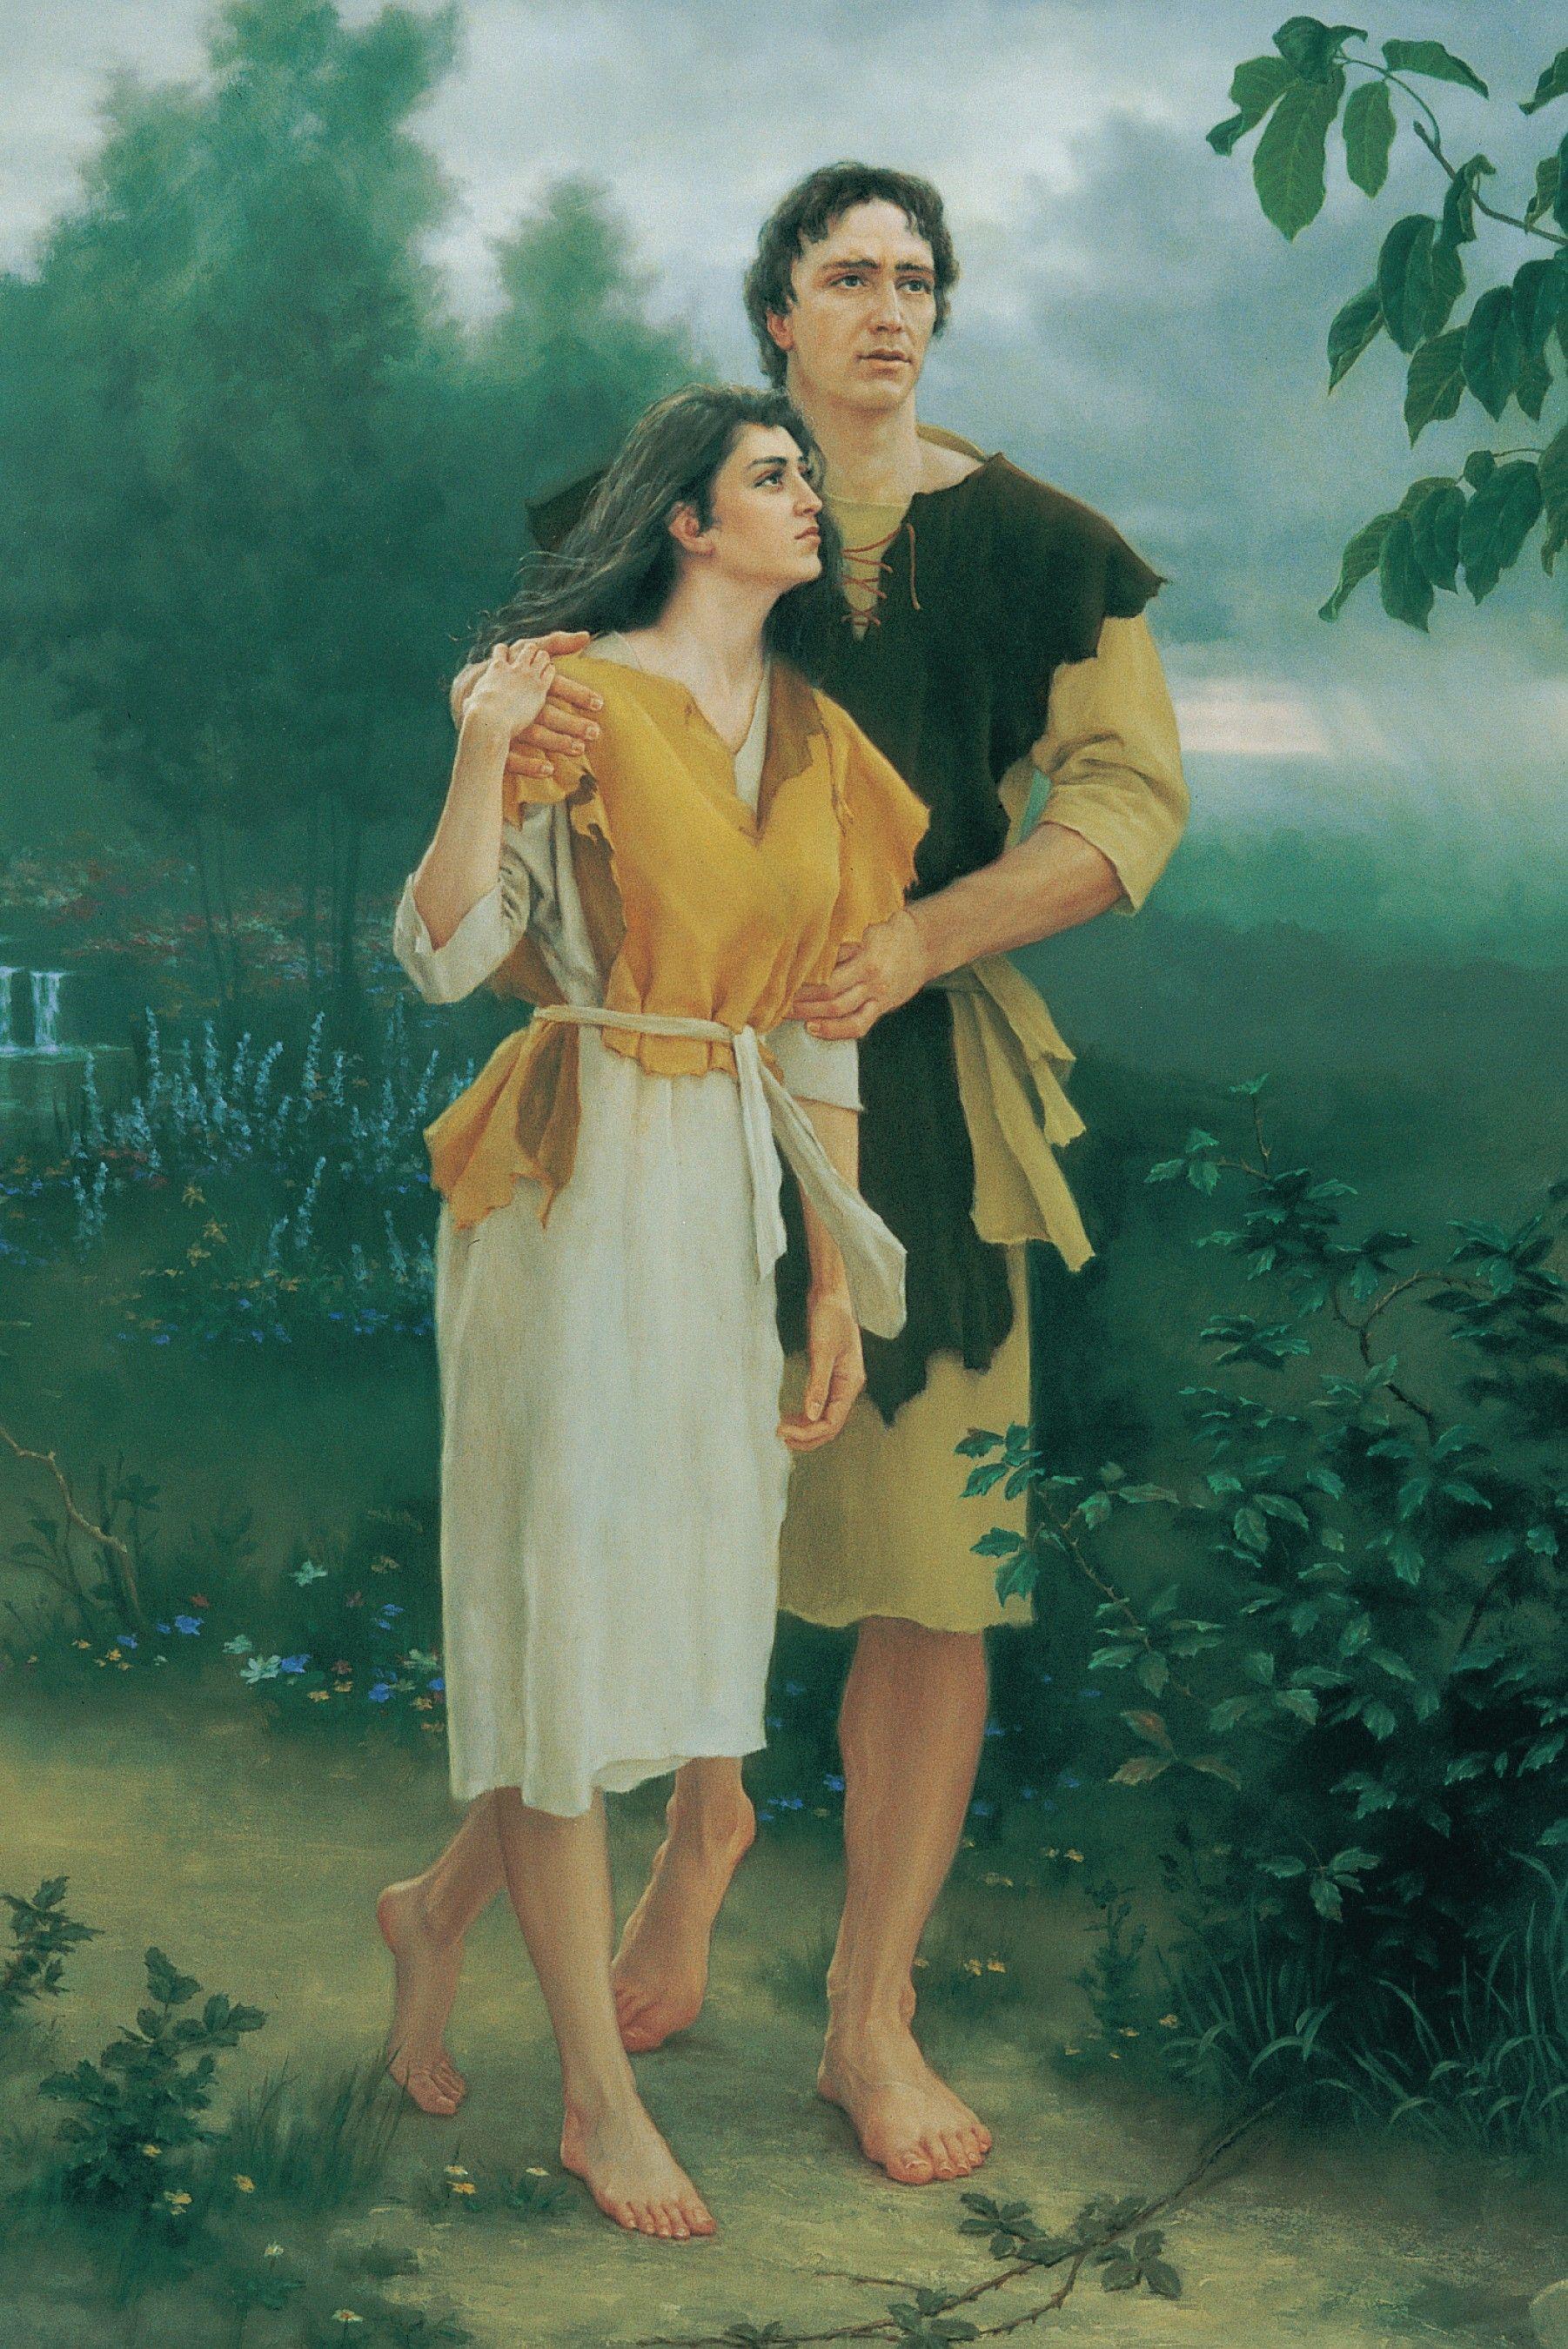 Leaving the Garden of Eden, by Joseph Brickey